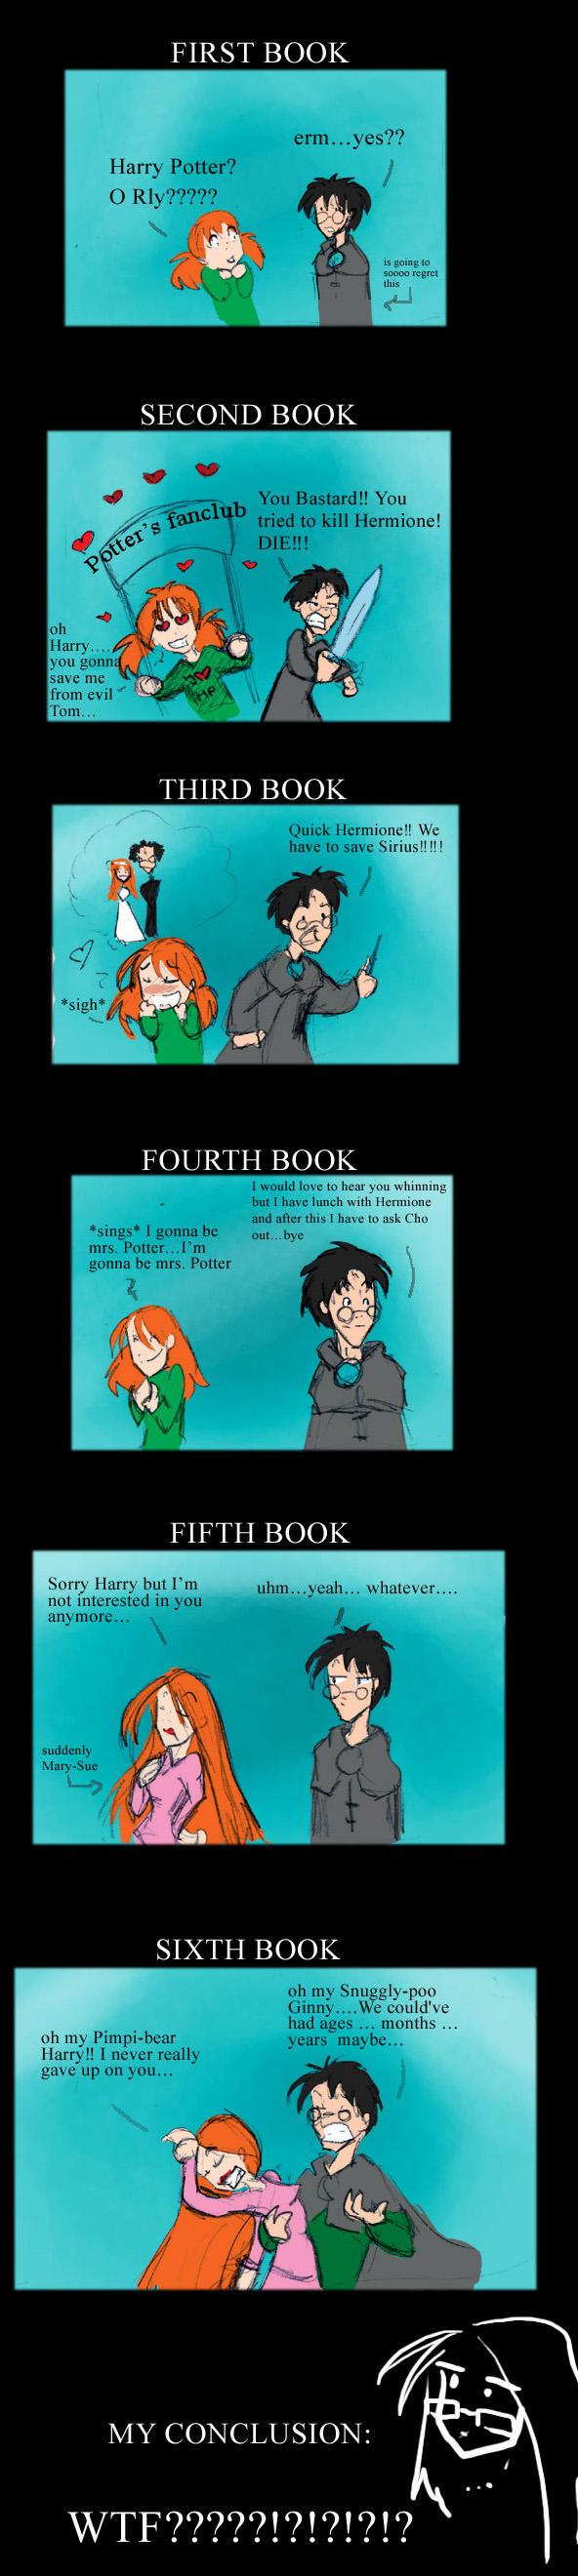 Canon = calidad? - Página 2 Six_years_of_Harry_and_Ginny__by_Eva_Black